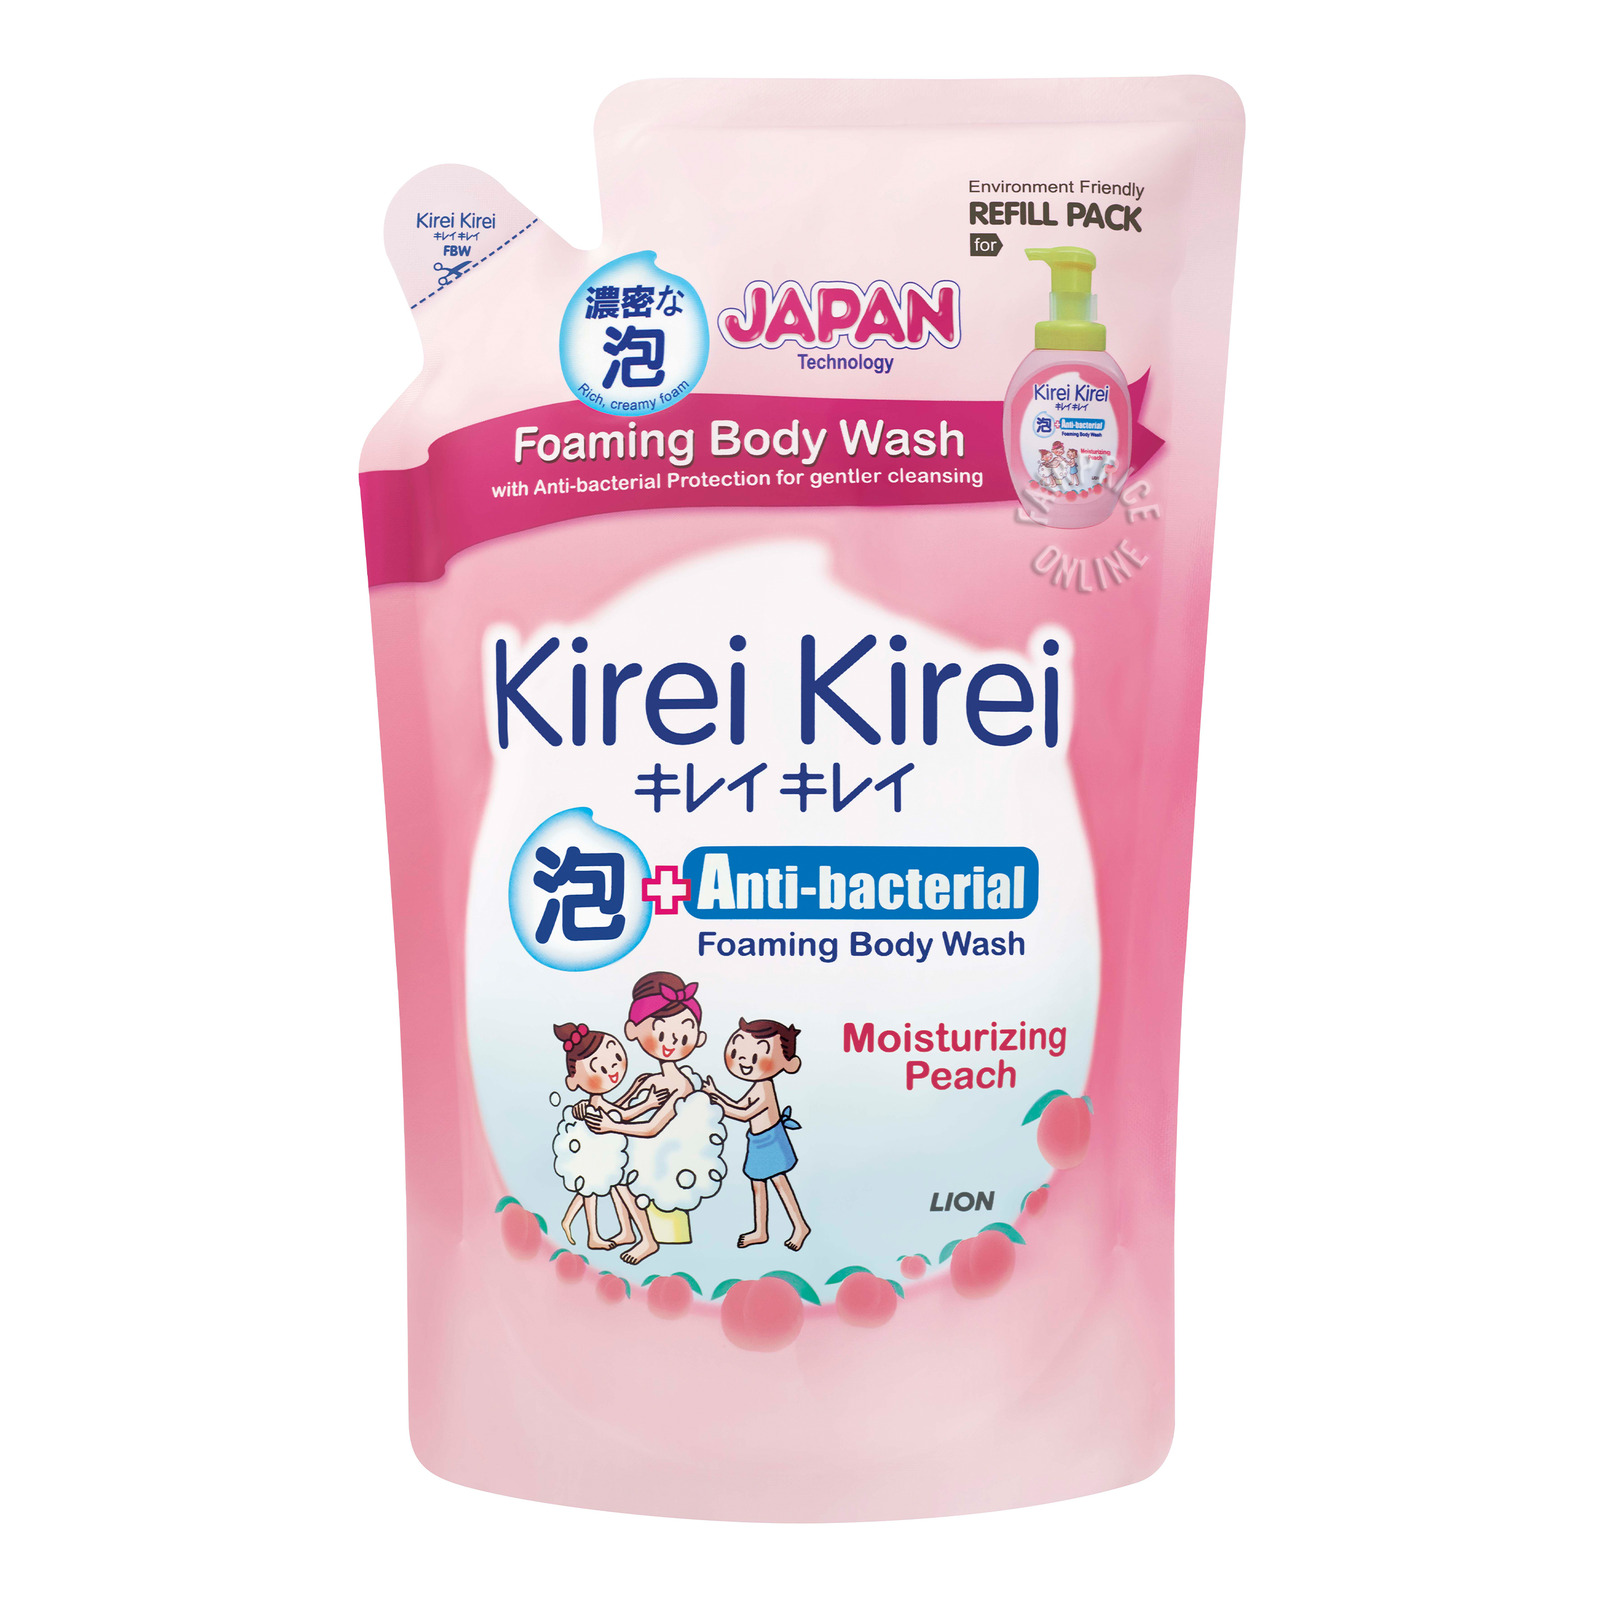 Kirei Kirei Anti-bacterial Body Wash Refill - MoisturisingPeach